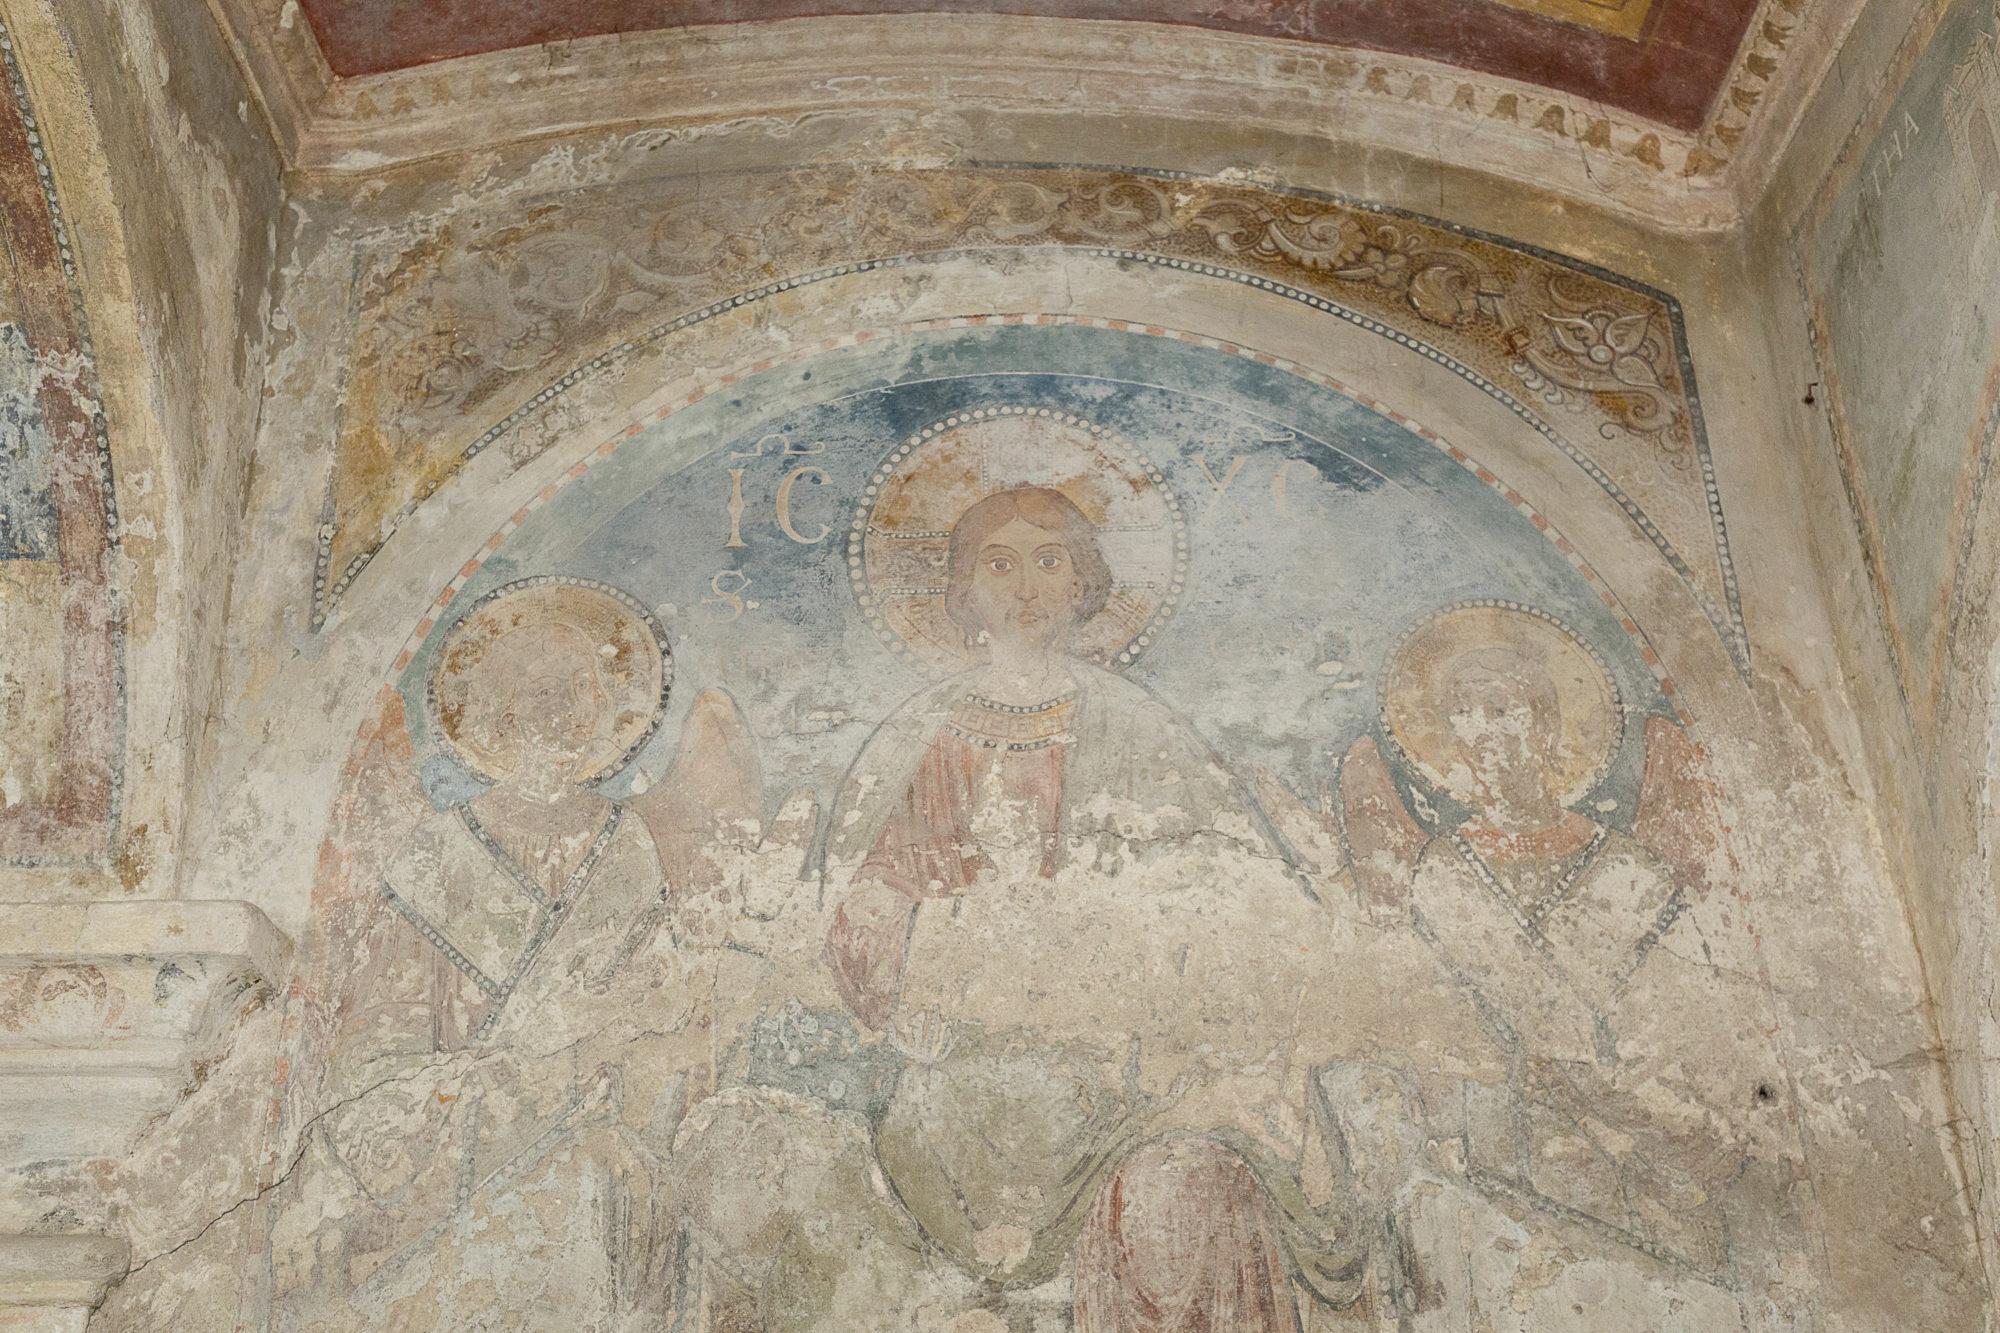 Sant Agnese In Agone Official Website